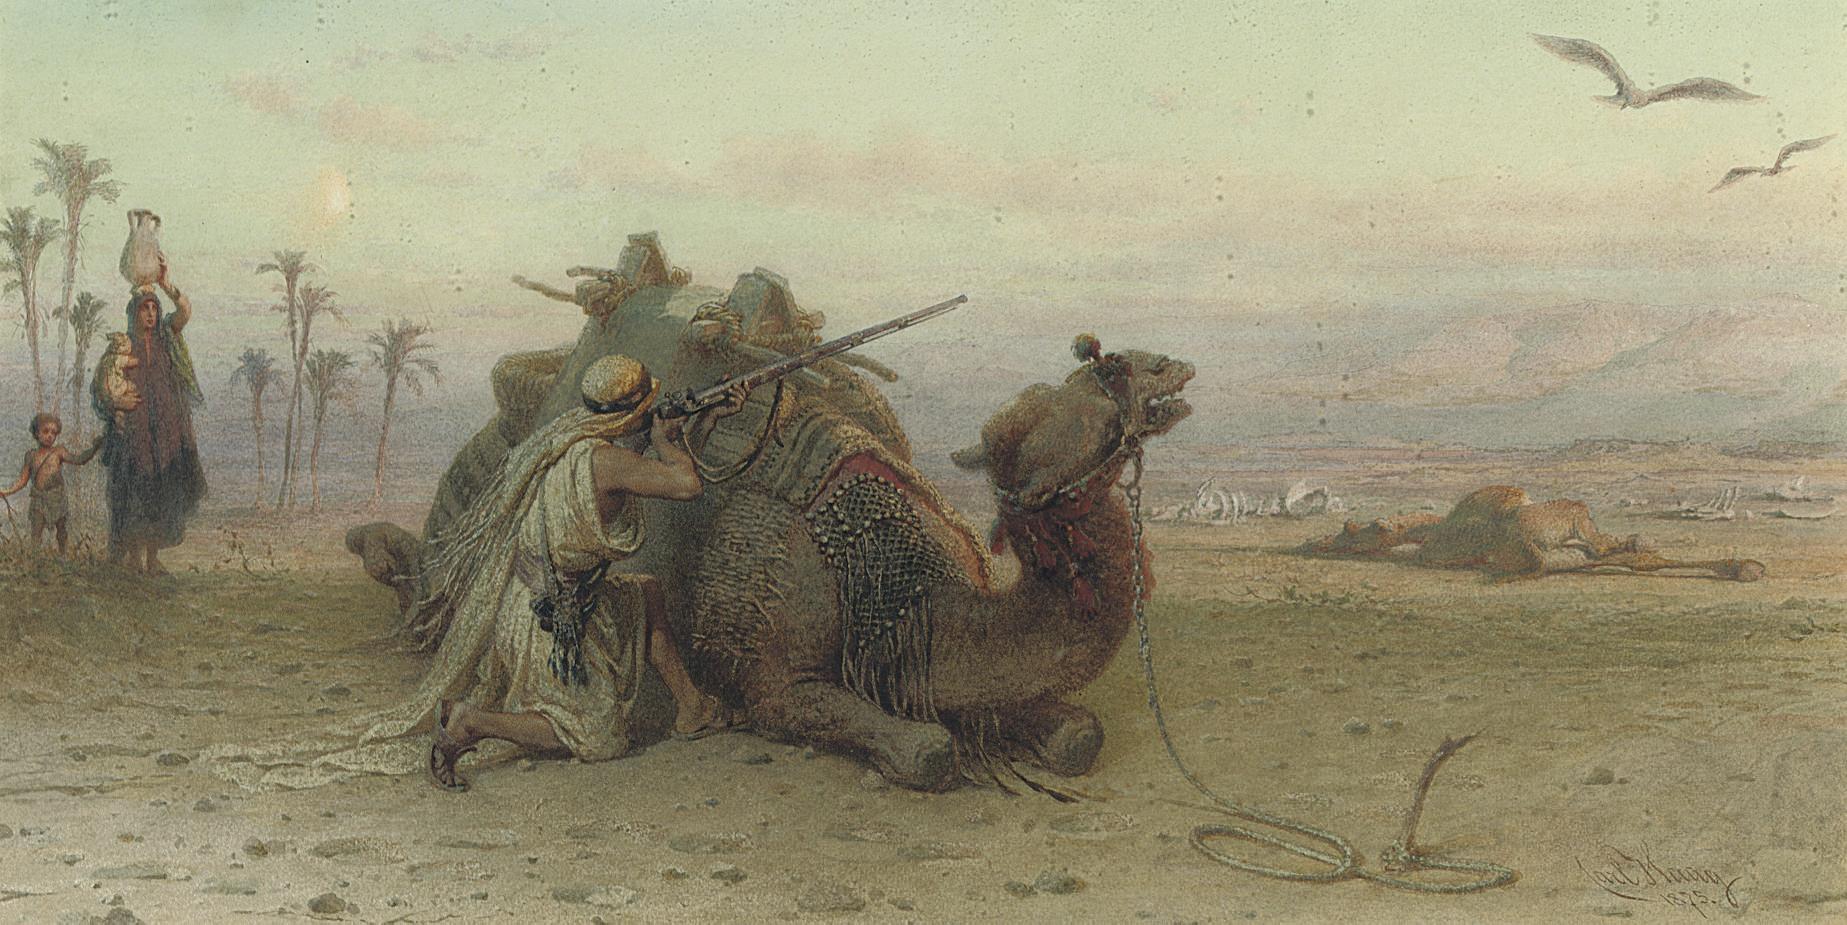 An Arab defending his family